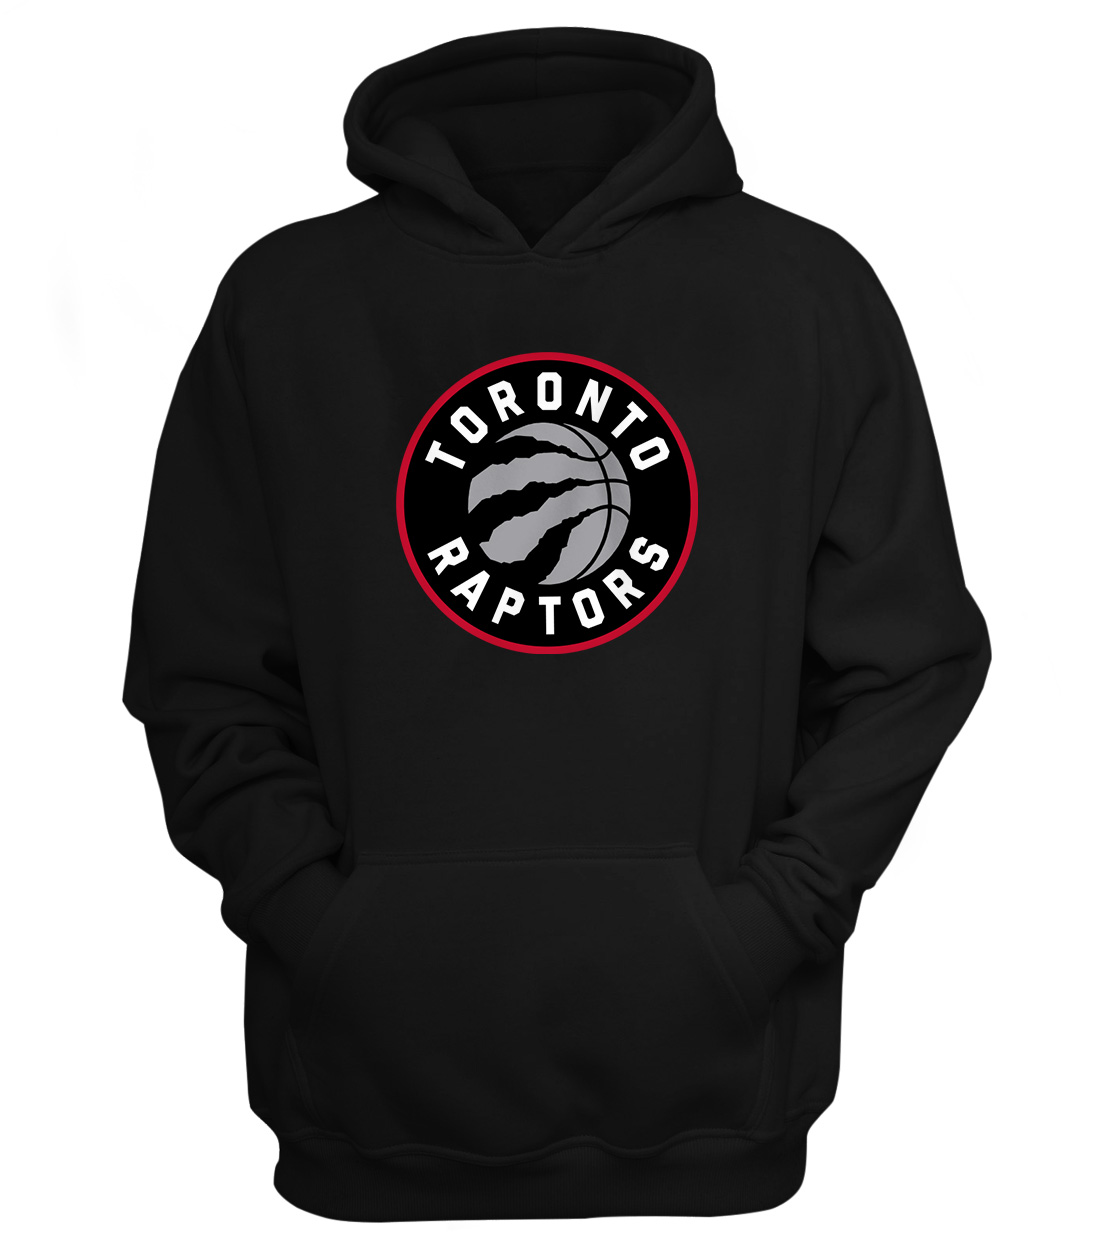 Toronto Raptors Hoodie (HD-BLC-NP-197-NBA-TOR-LOGO)